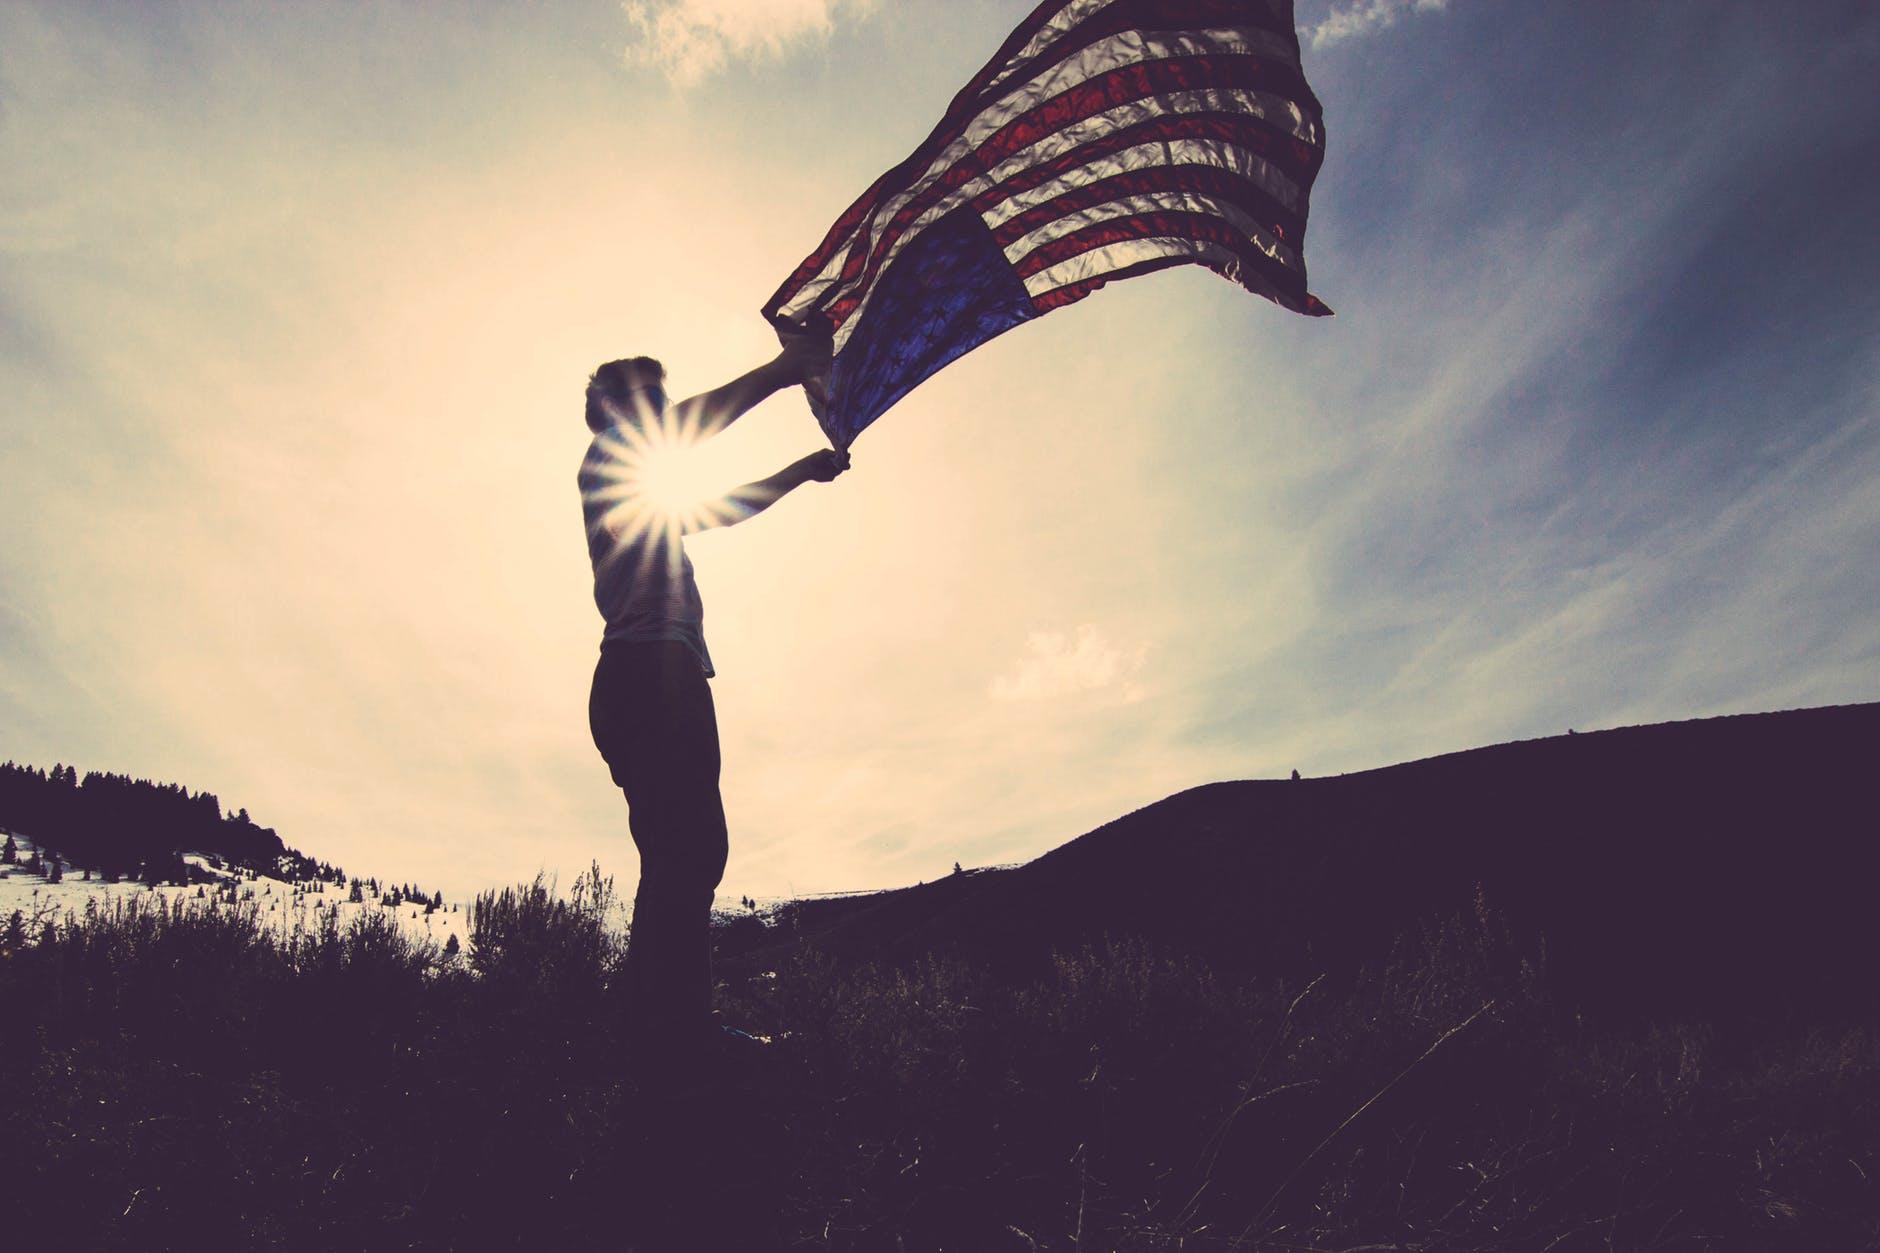 A man holding a U.S. flag